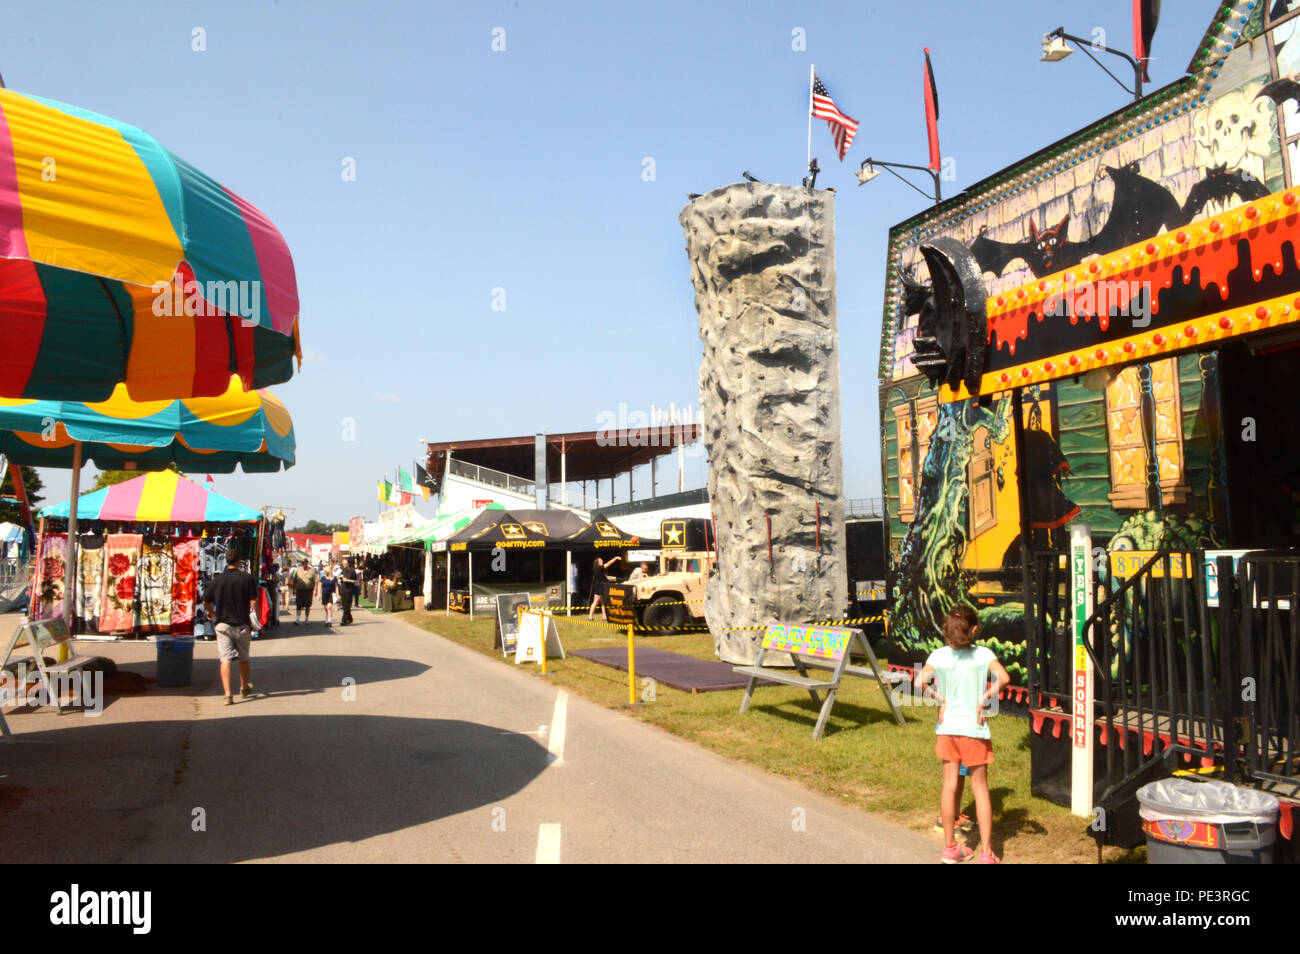 Champlain Valley Fair Stock Photos & Champlain Valley Fair